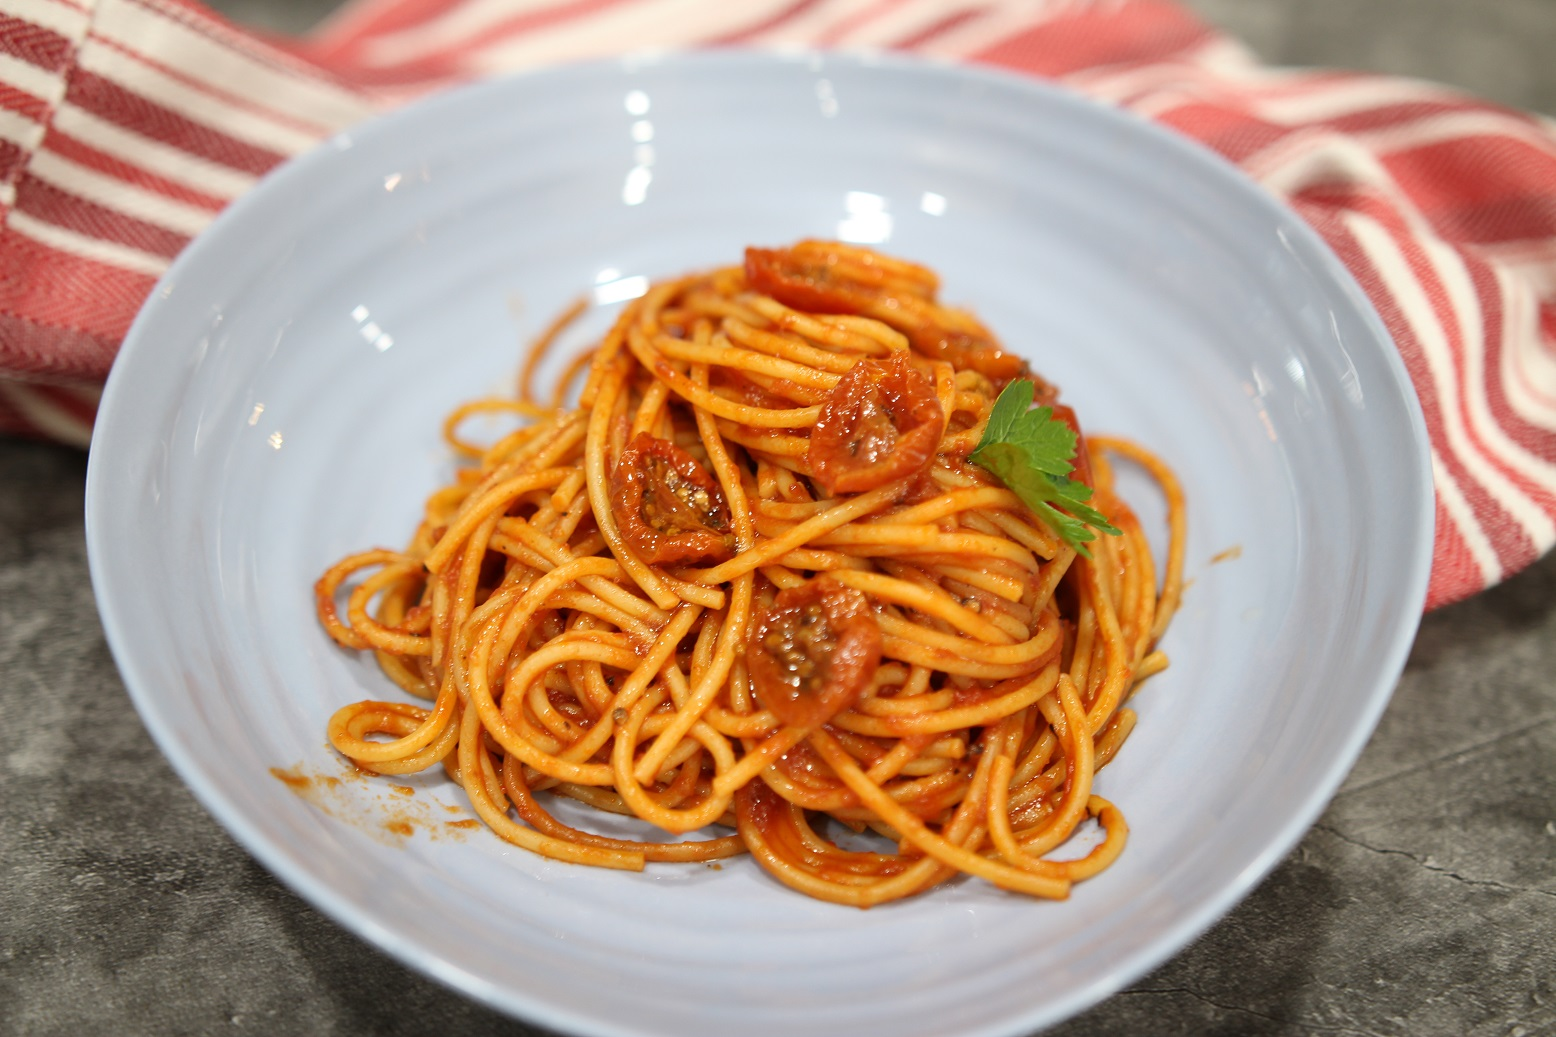 Spaghetti all'Assassina 'Killer Spaghetti'